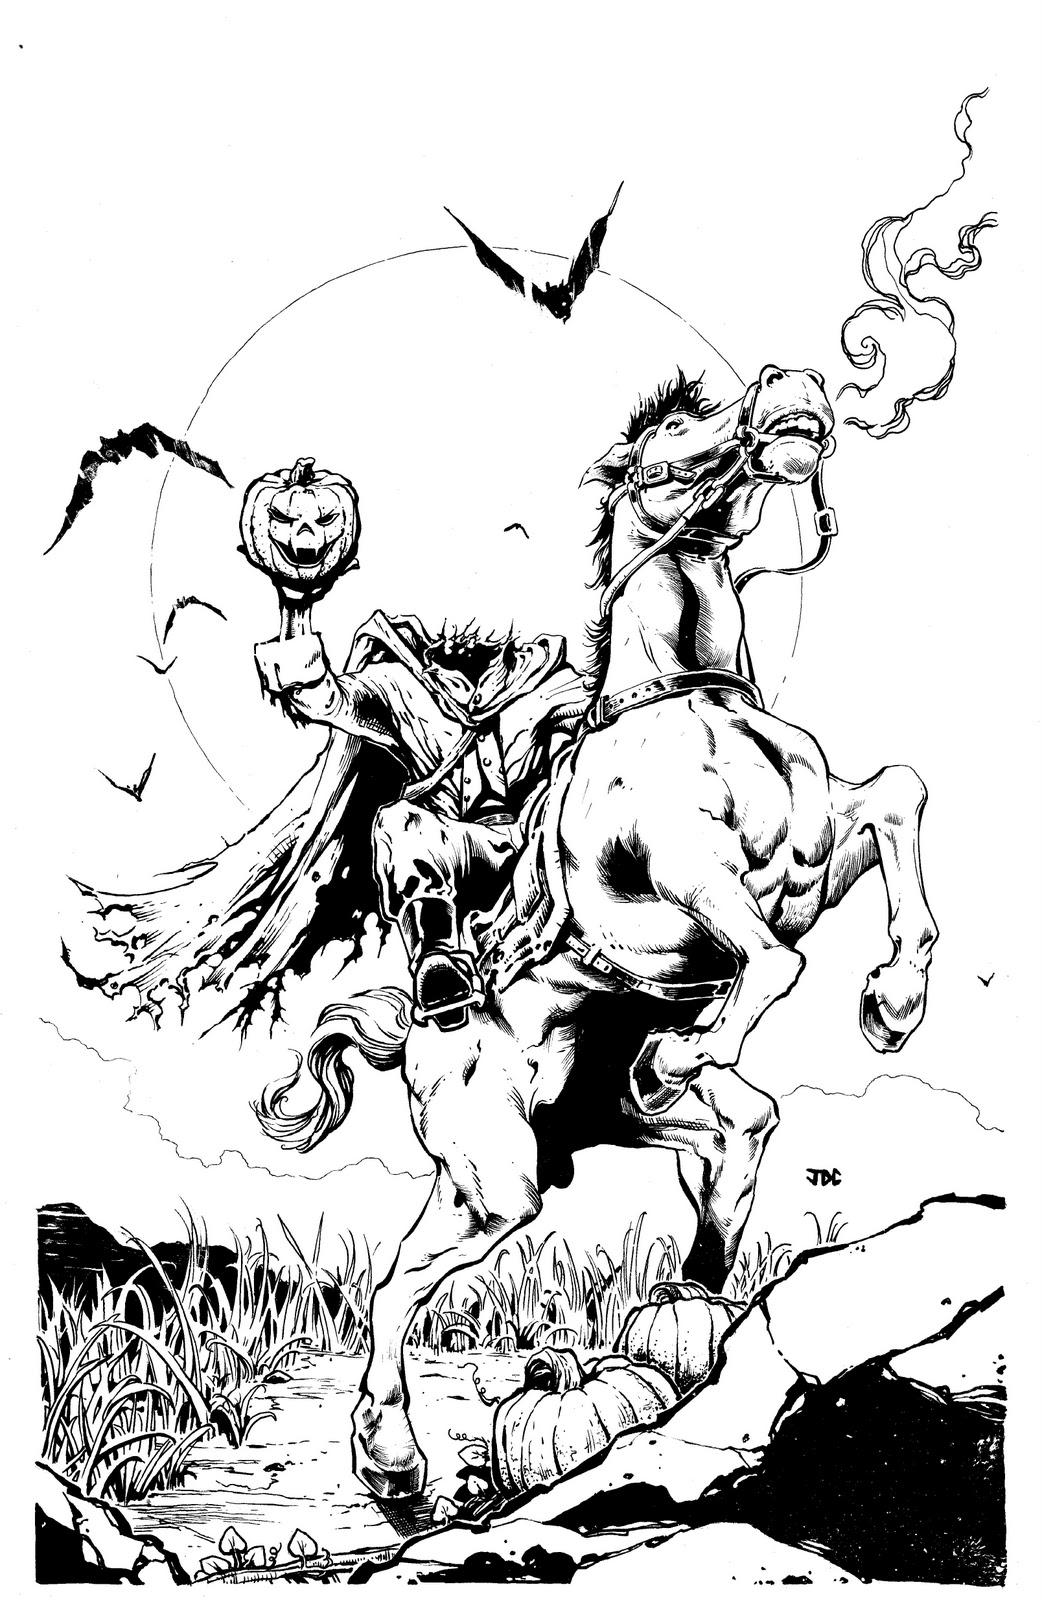 the headless horseman drawing headless horseman headless horseman coloring pages